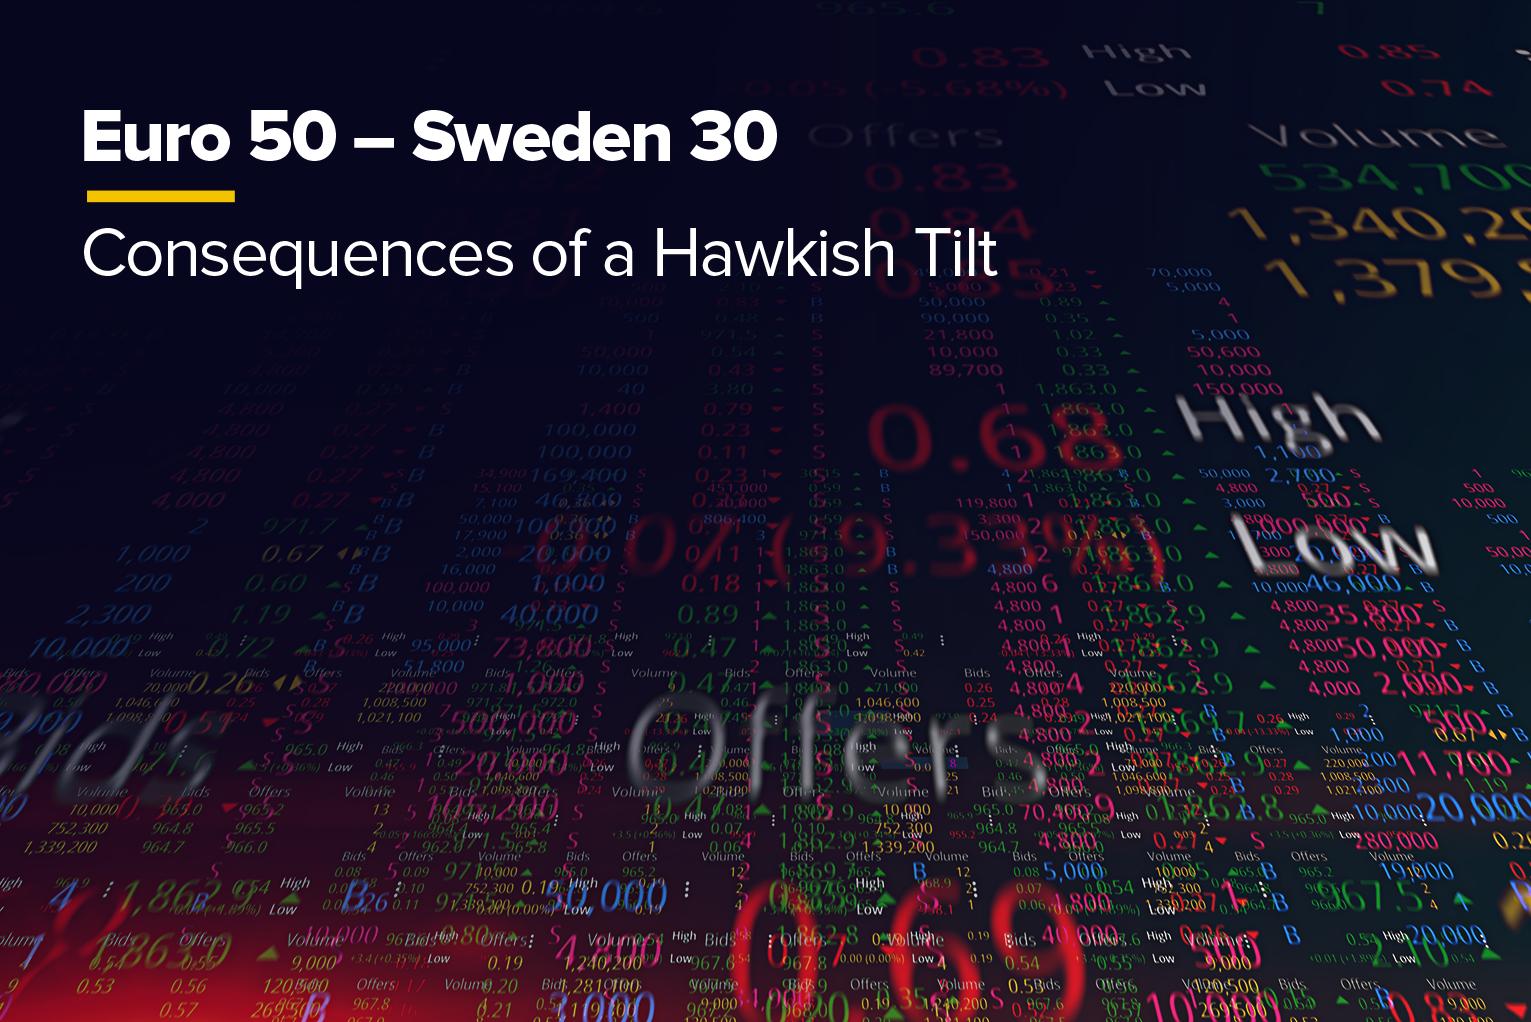 Euro 50 - Sweden 30 Consequences of a Hawkish Tilt